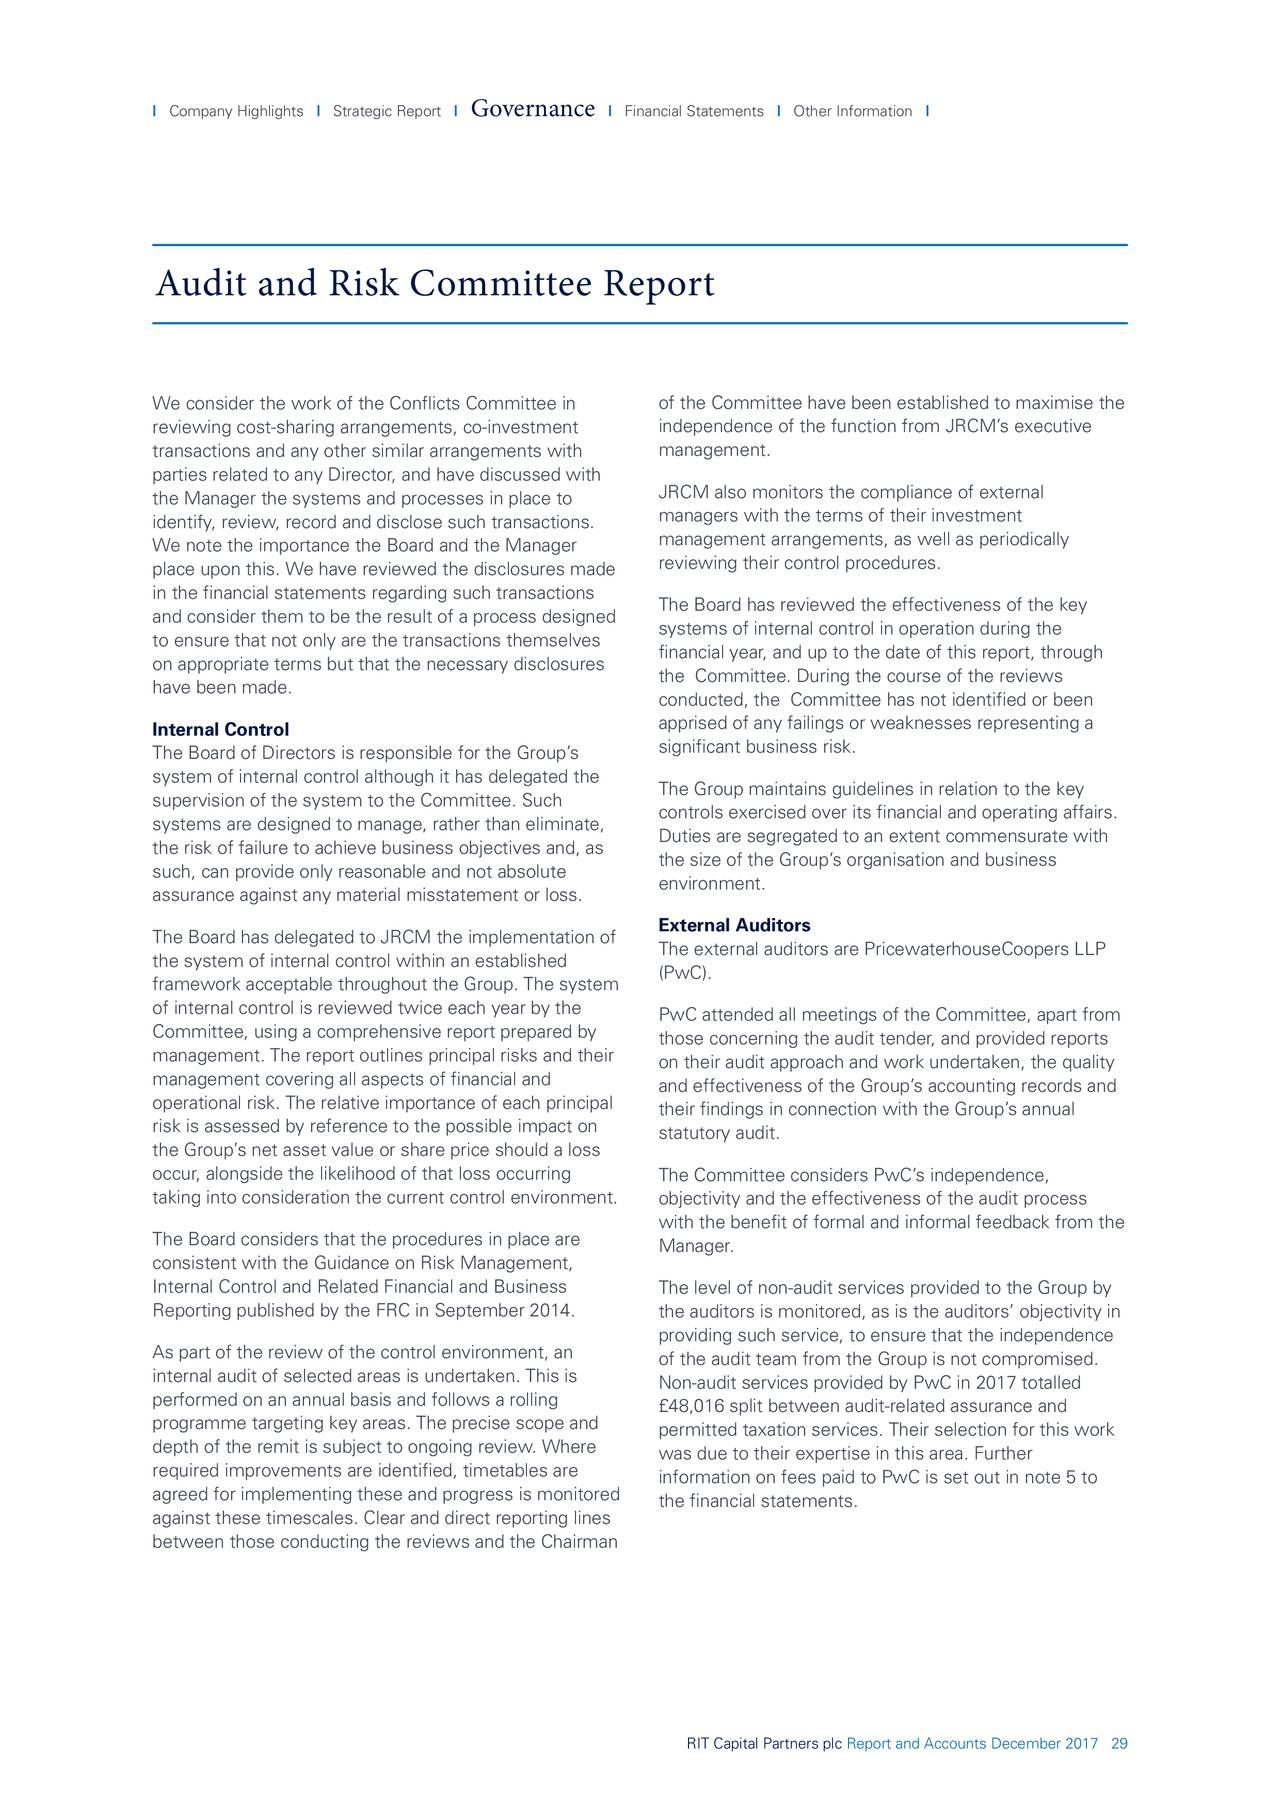 RIT Capital Partners Annual Report 2017 - RIT Capital Partners Plc. (OTCMKTS:RITPF) | Seeking Alpha